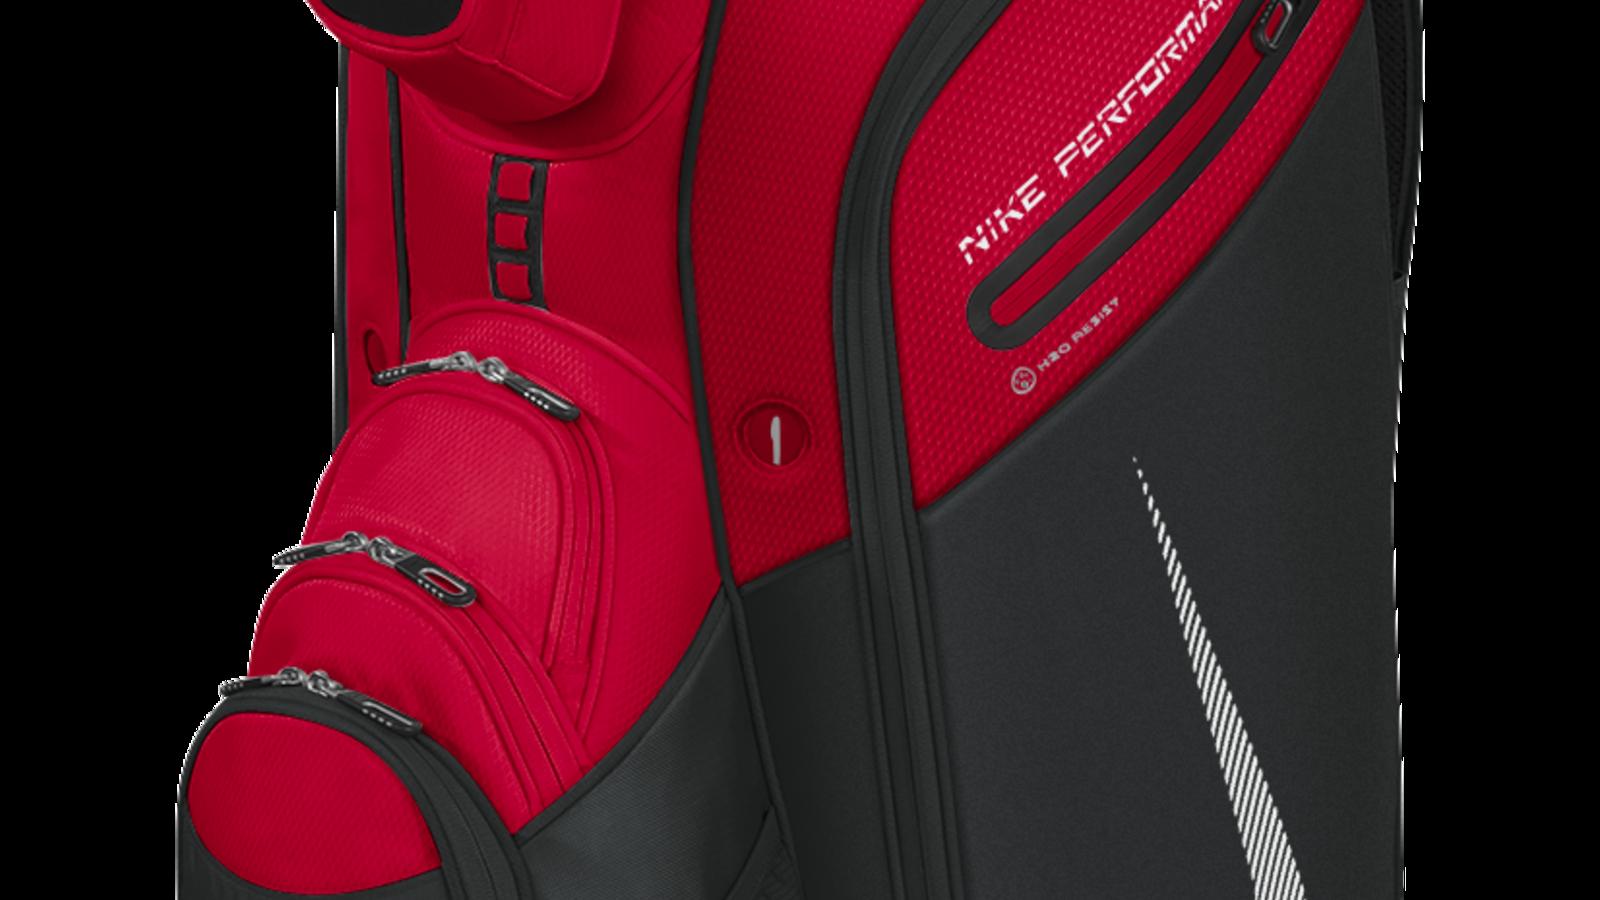 45cd3d85fdc8 Nike Performance Cart Bag  Modern Design and Superior Storage - Nike ...